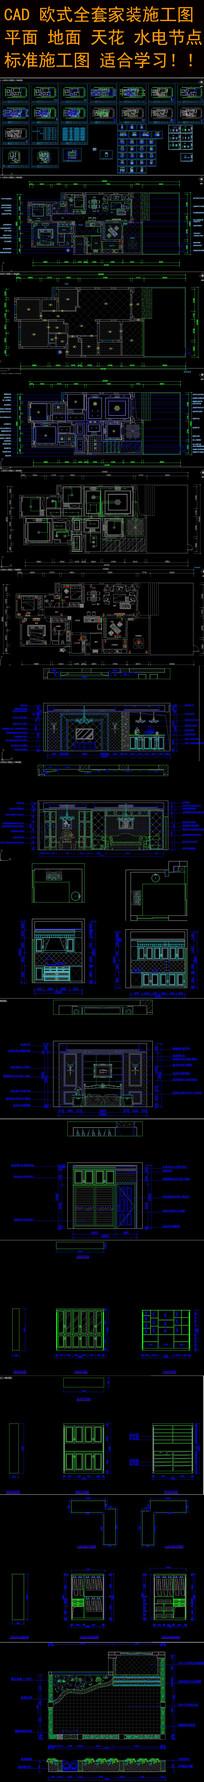 CAD欧式家装装修施工图节点